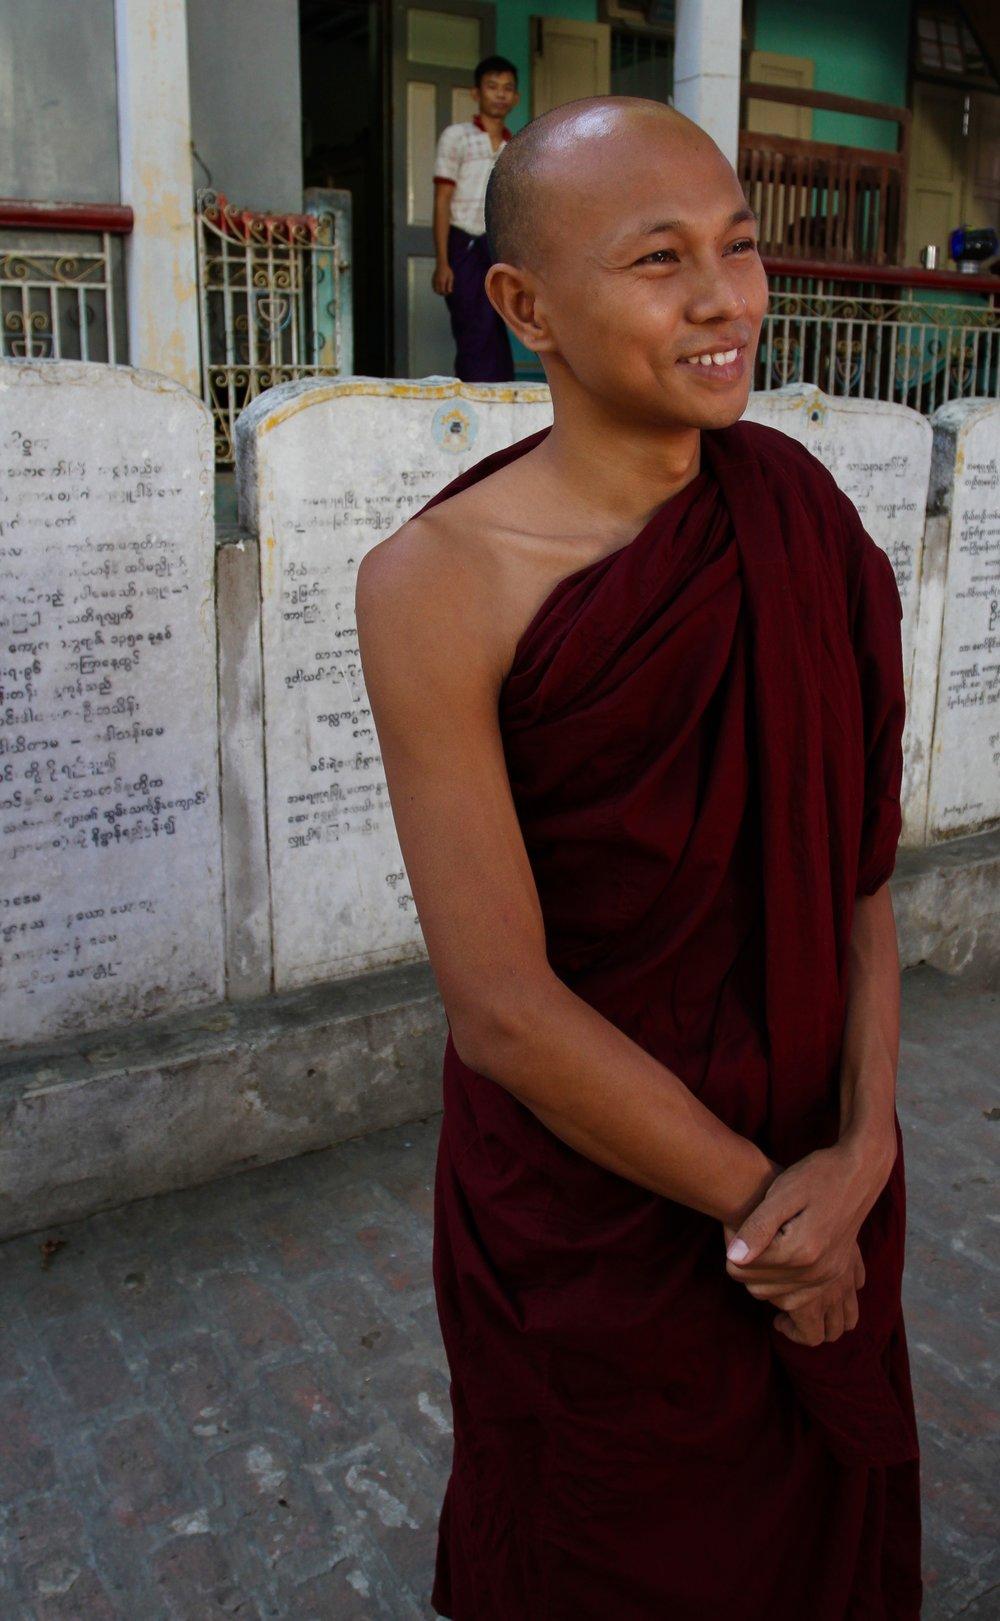 monk web 2.jpeg